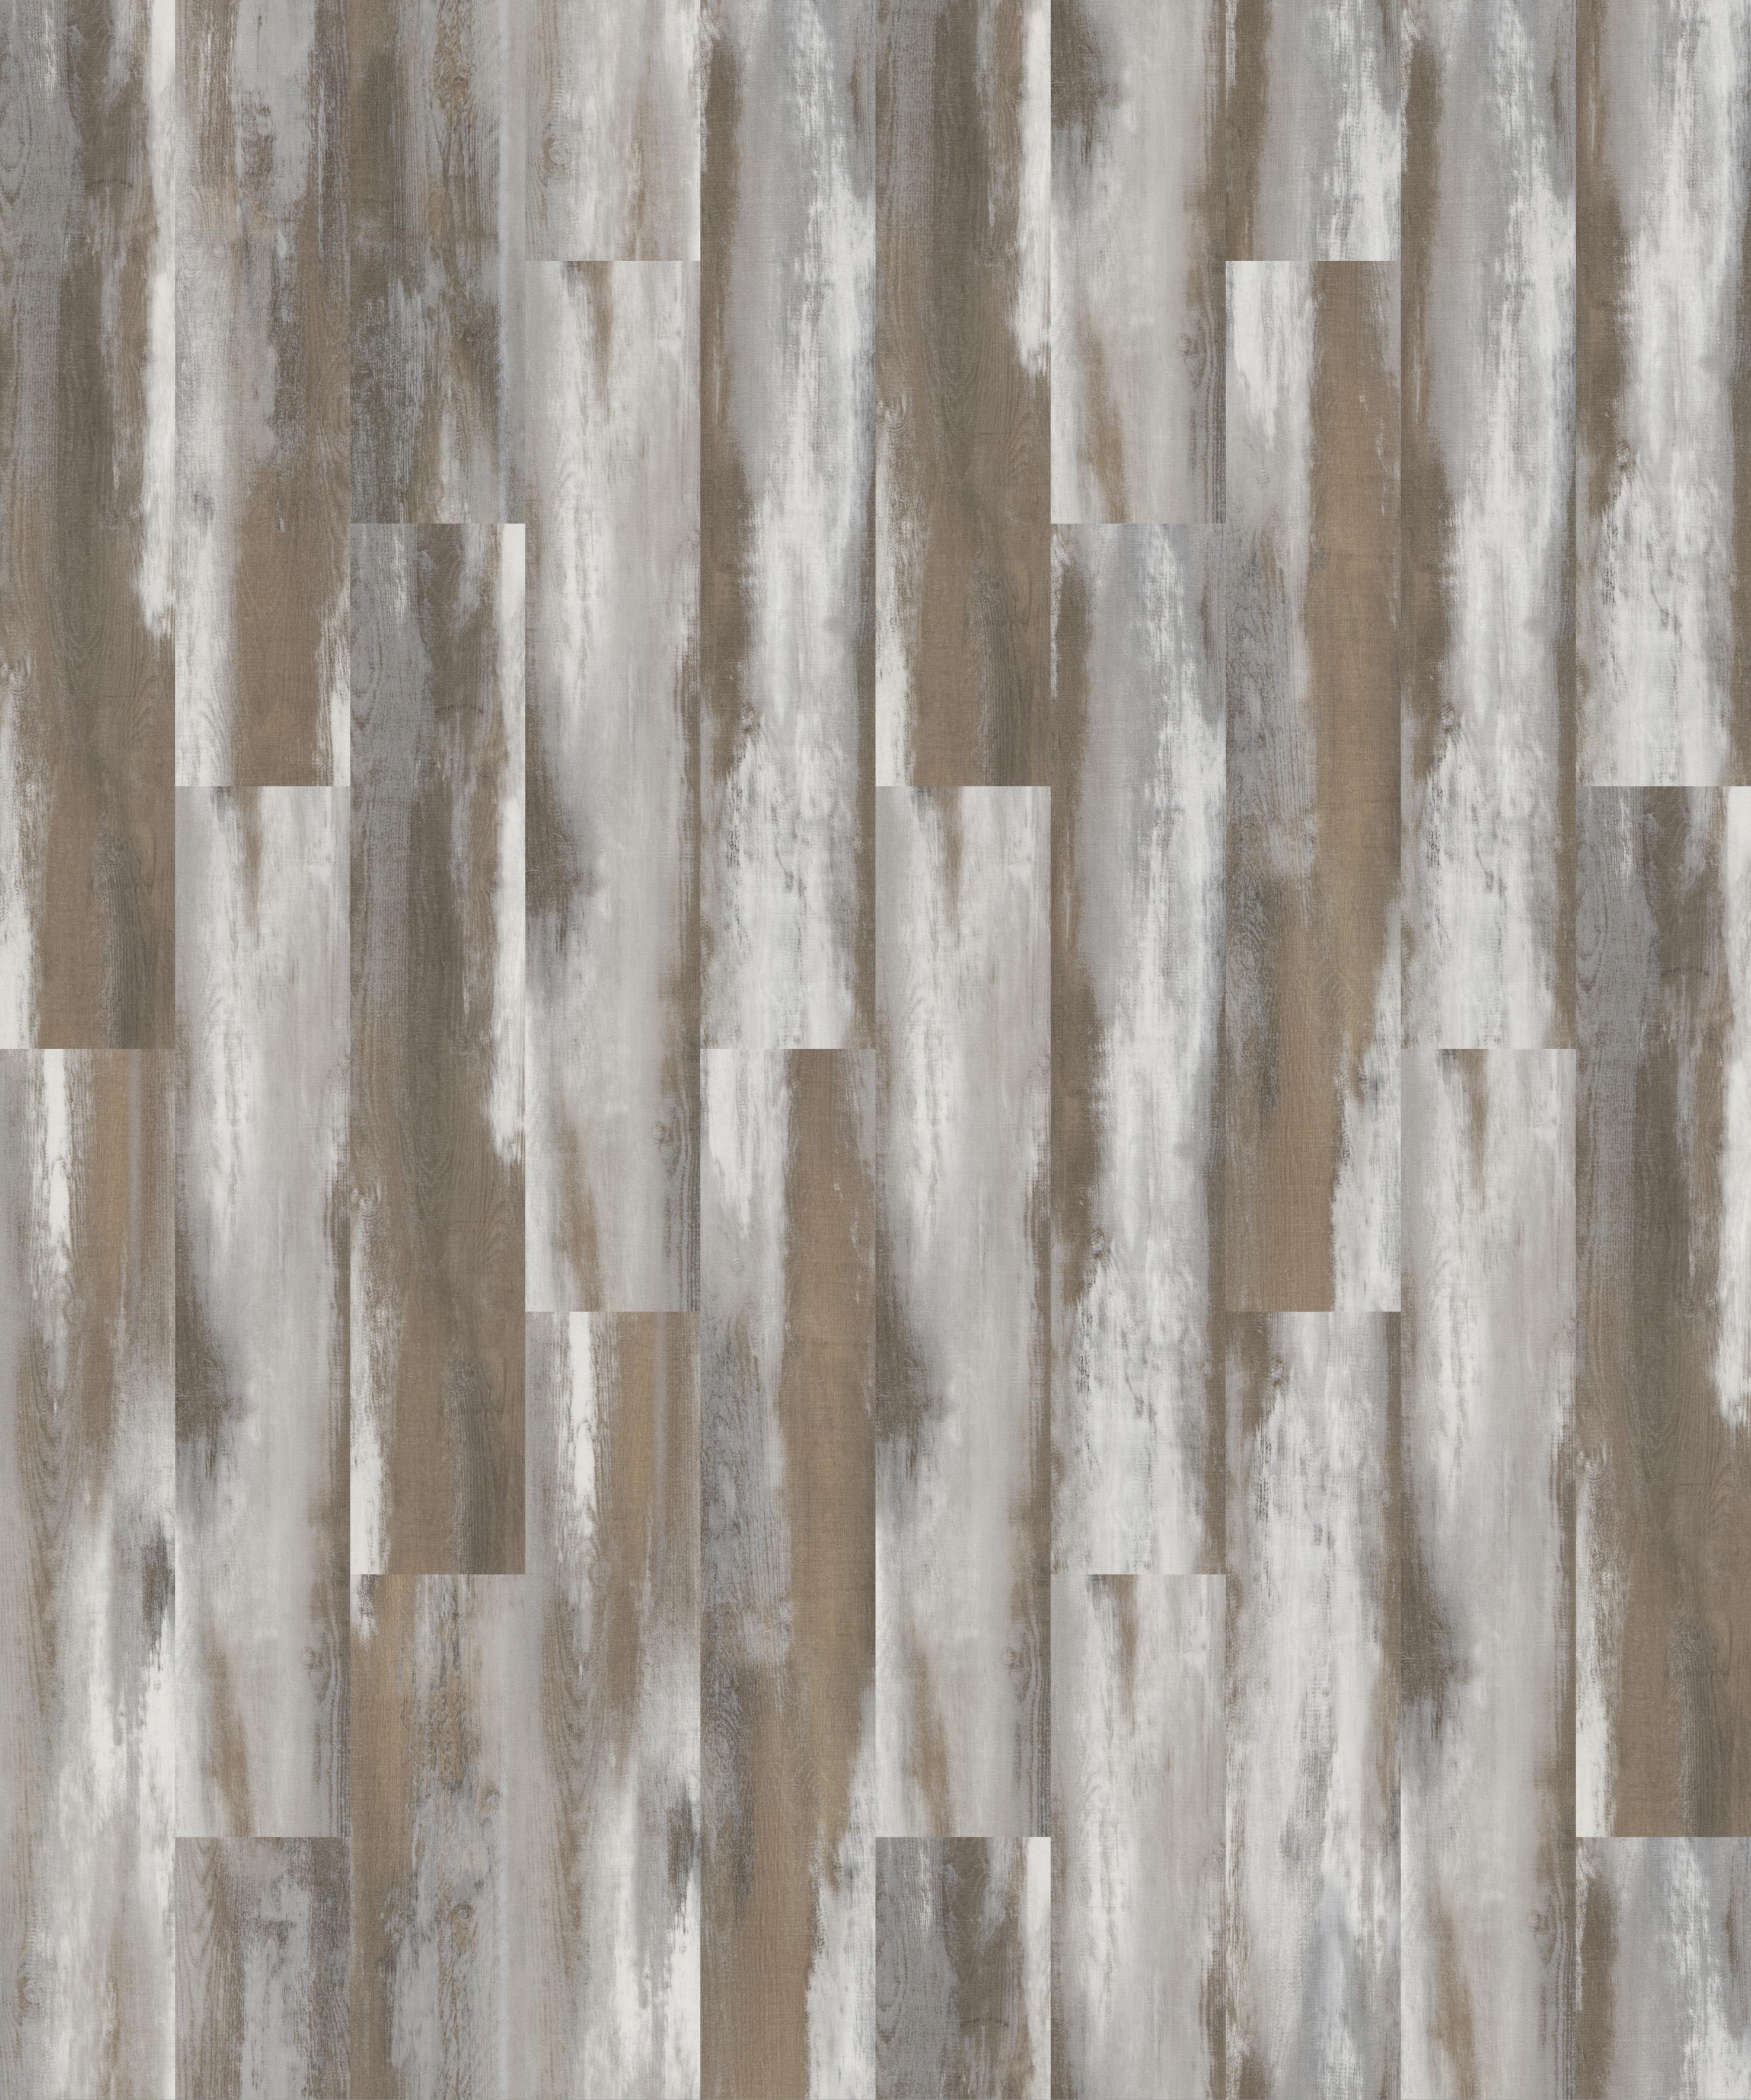 Allura Flex 0 55 Wood Loose Lay Tiles Forbo Flooring Systems